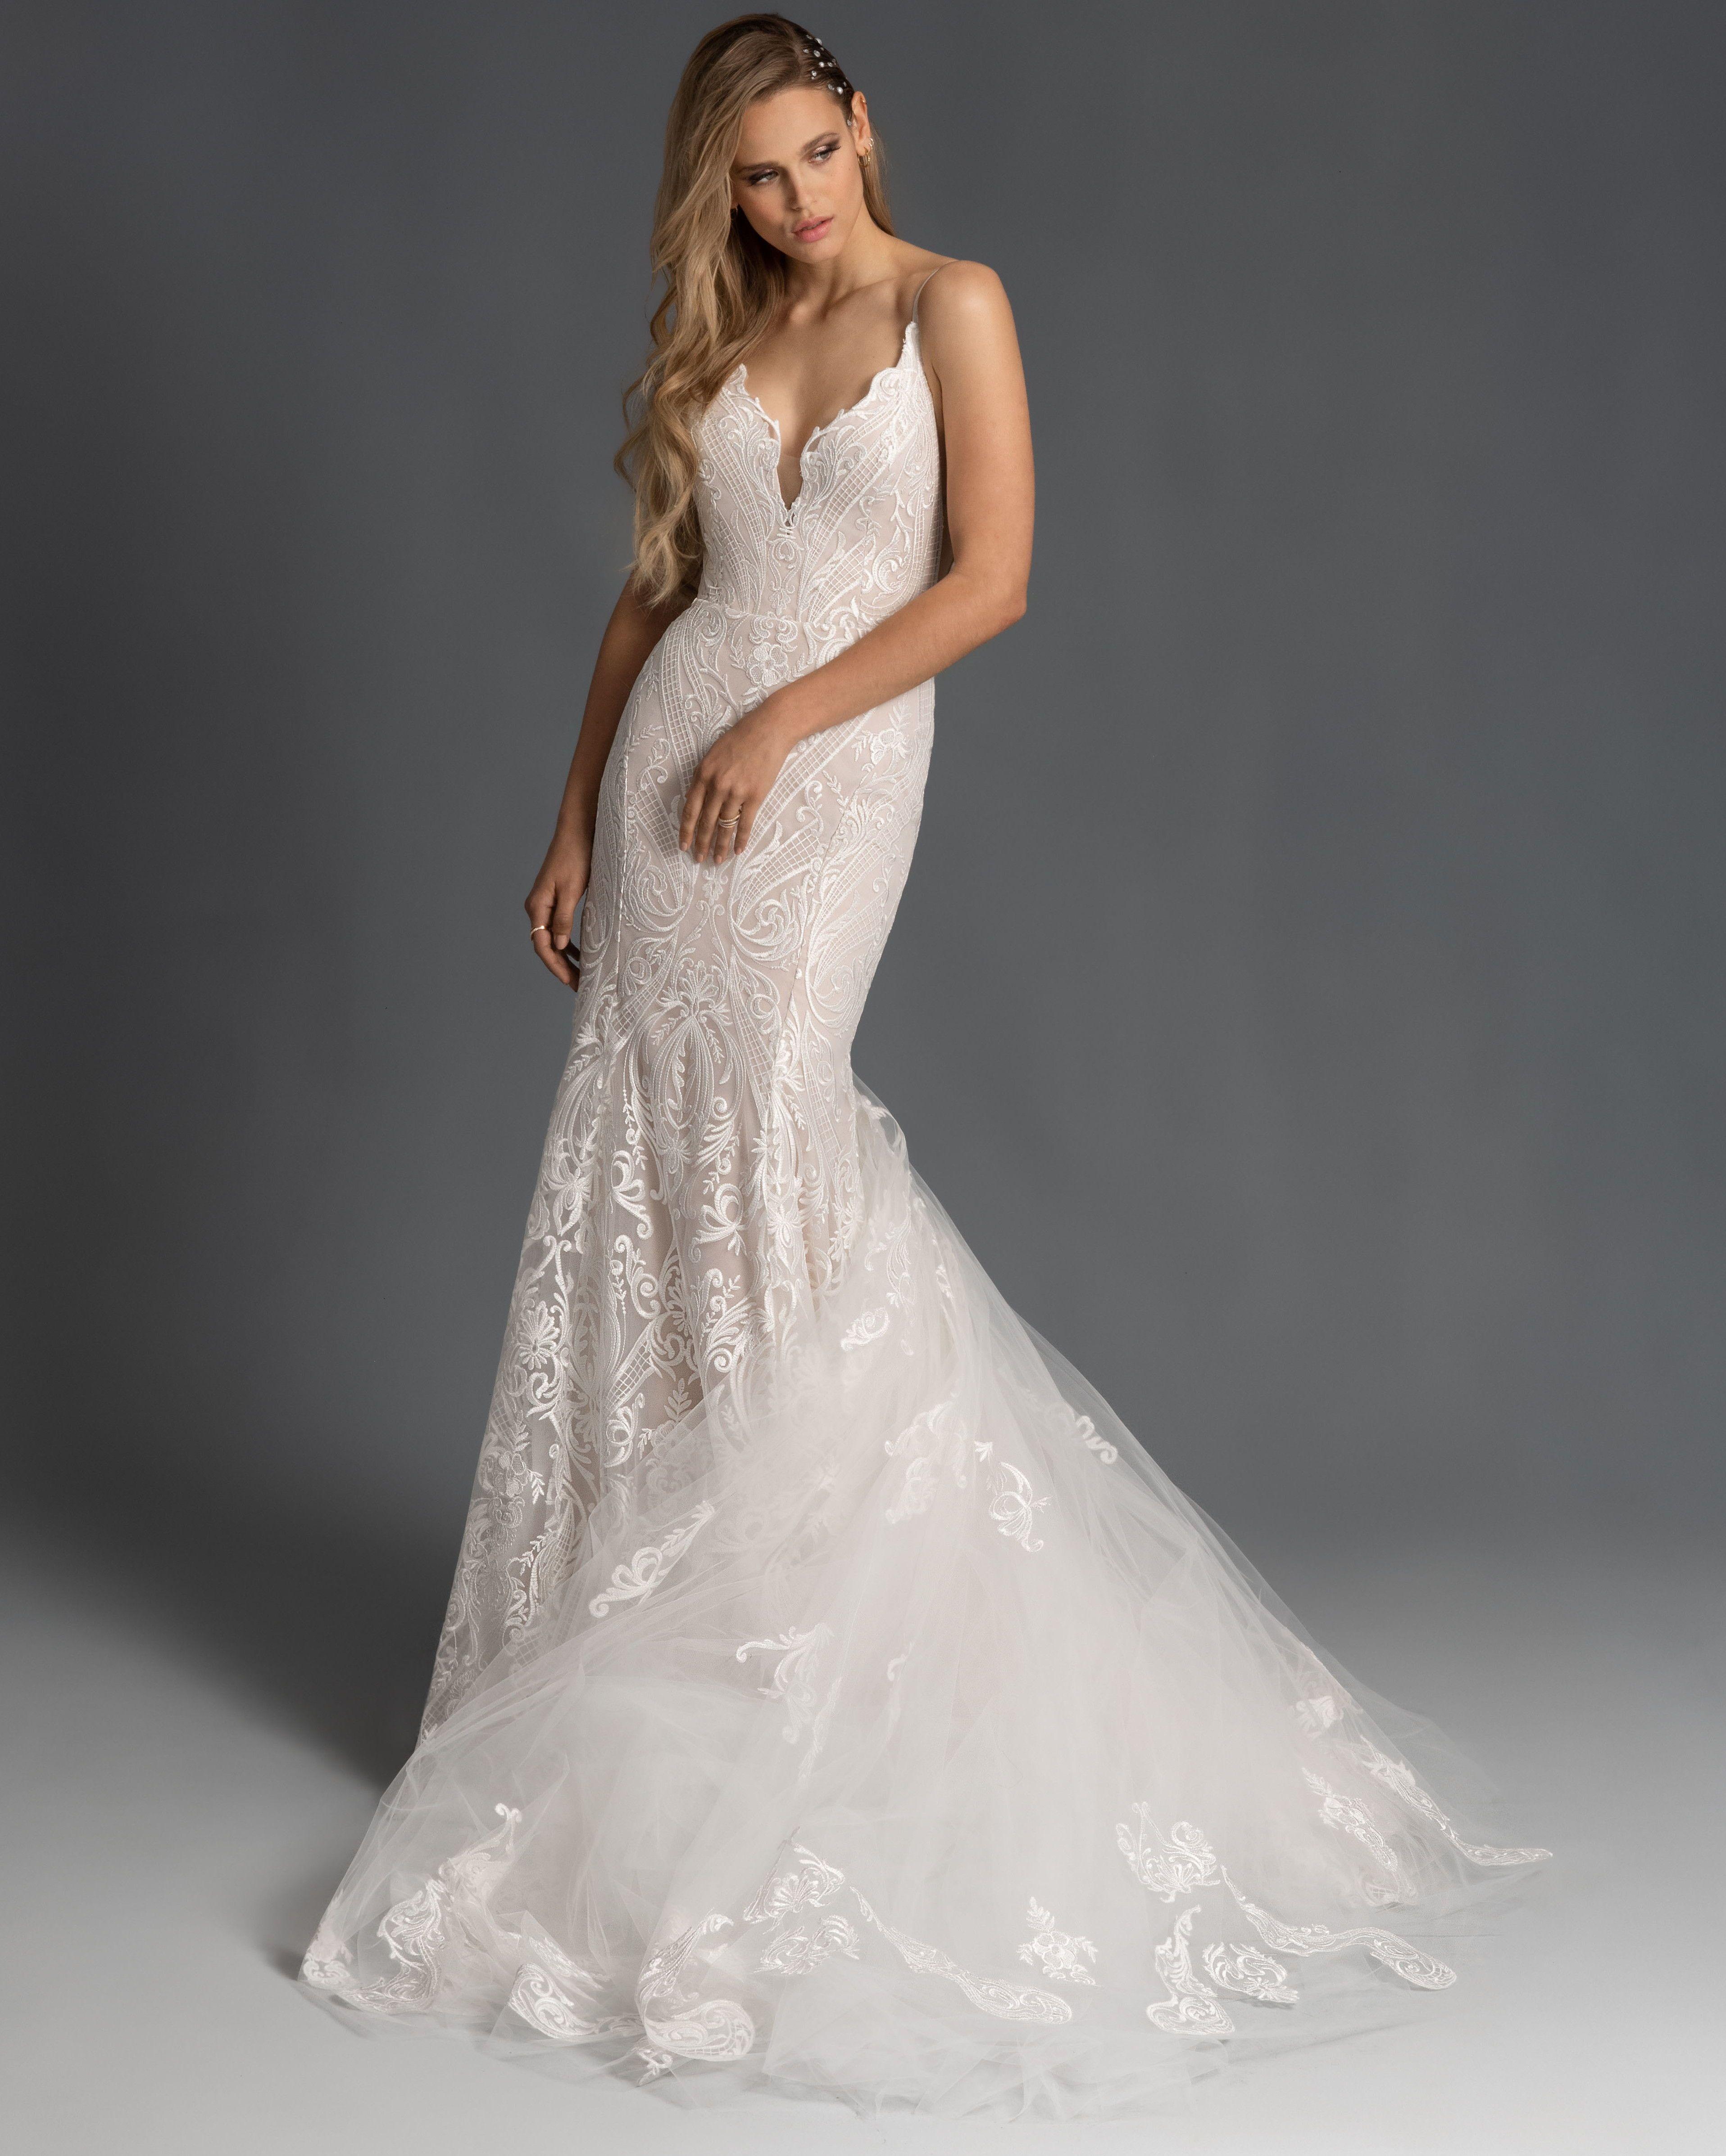 Hayley Paige Spring 2020 Wedding Dress Collection Sheath Wedding Dress Lace Wedding Dresses Wedding Dresses Blush [ 4788 x 3832 Pixel ]